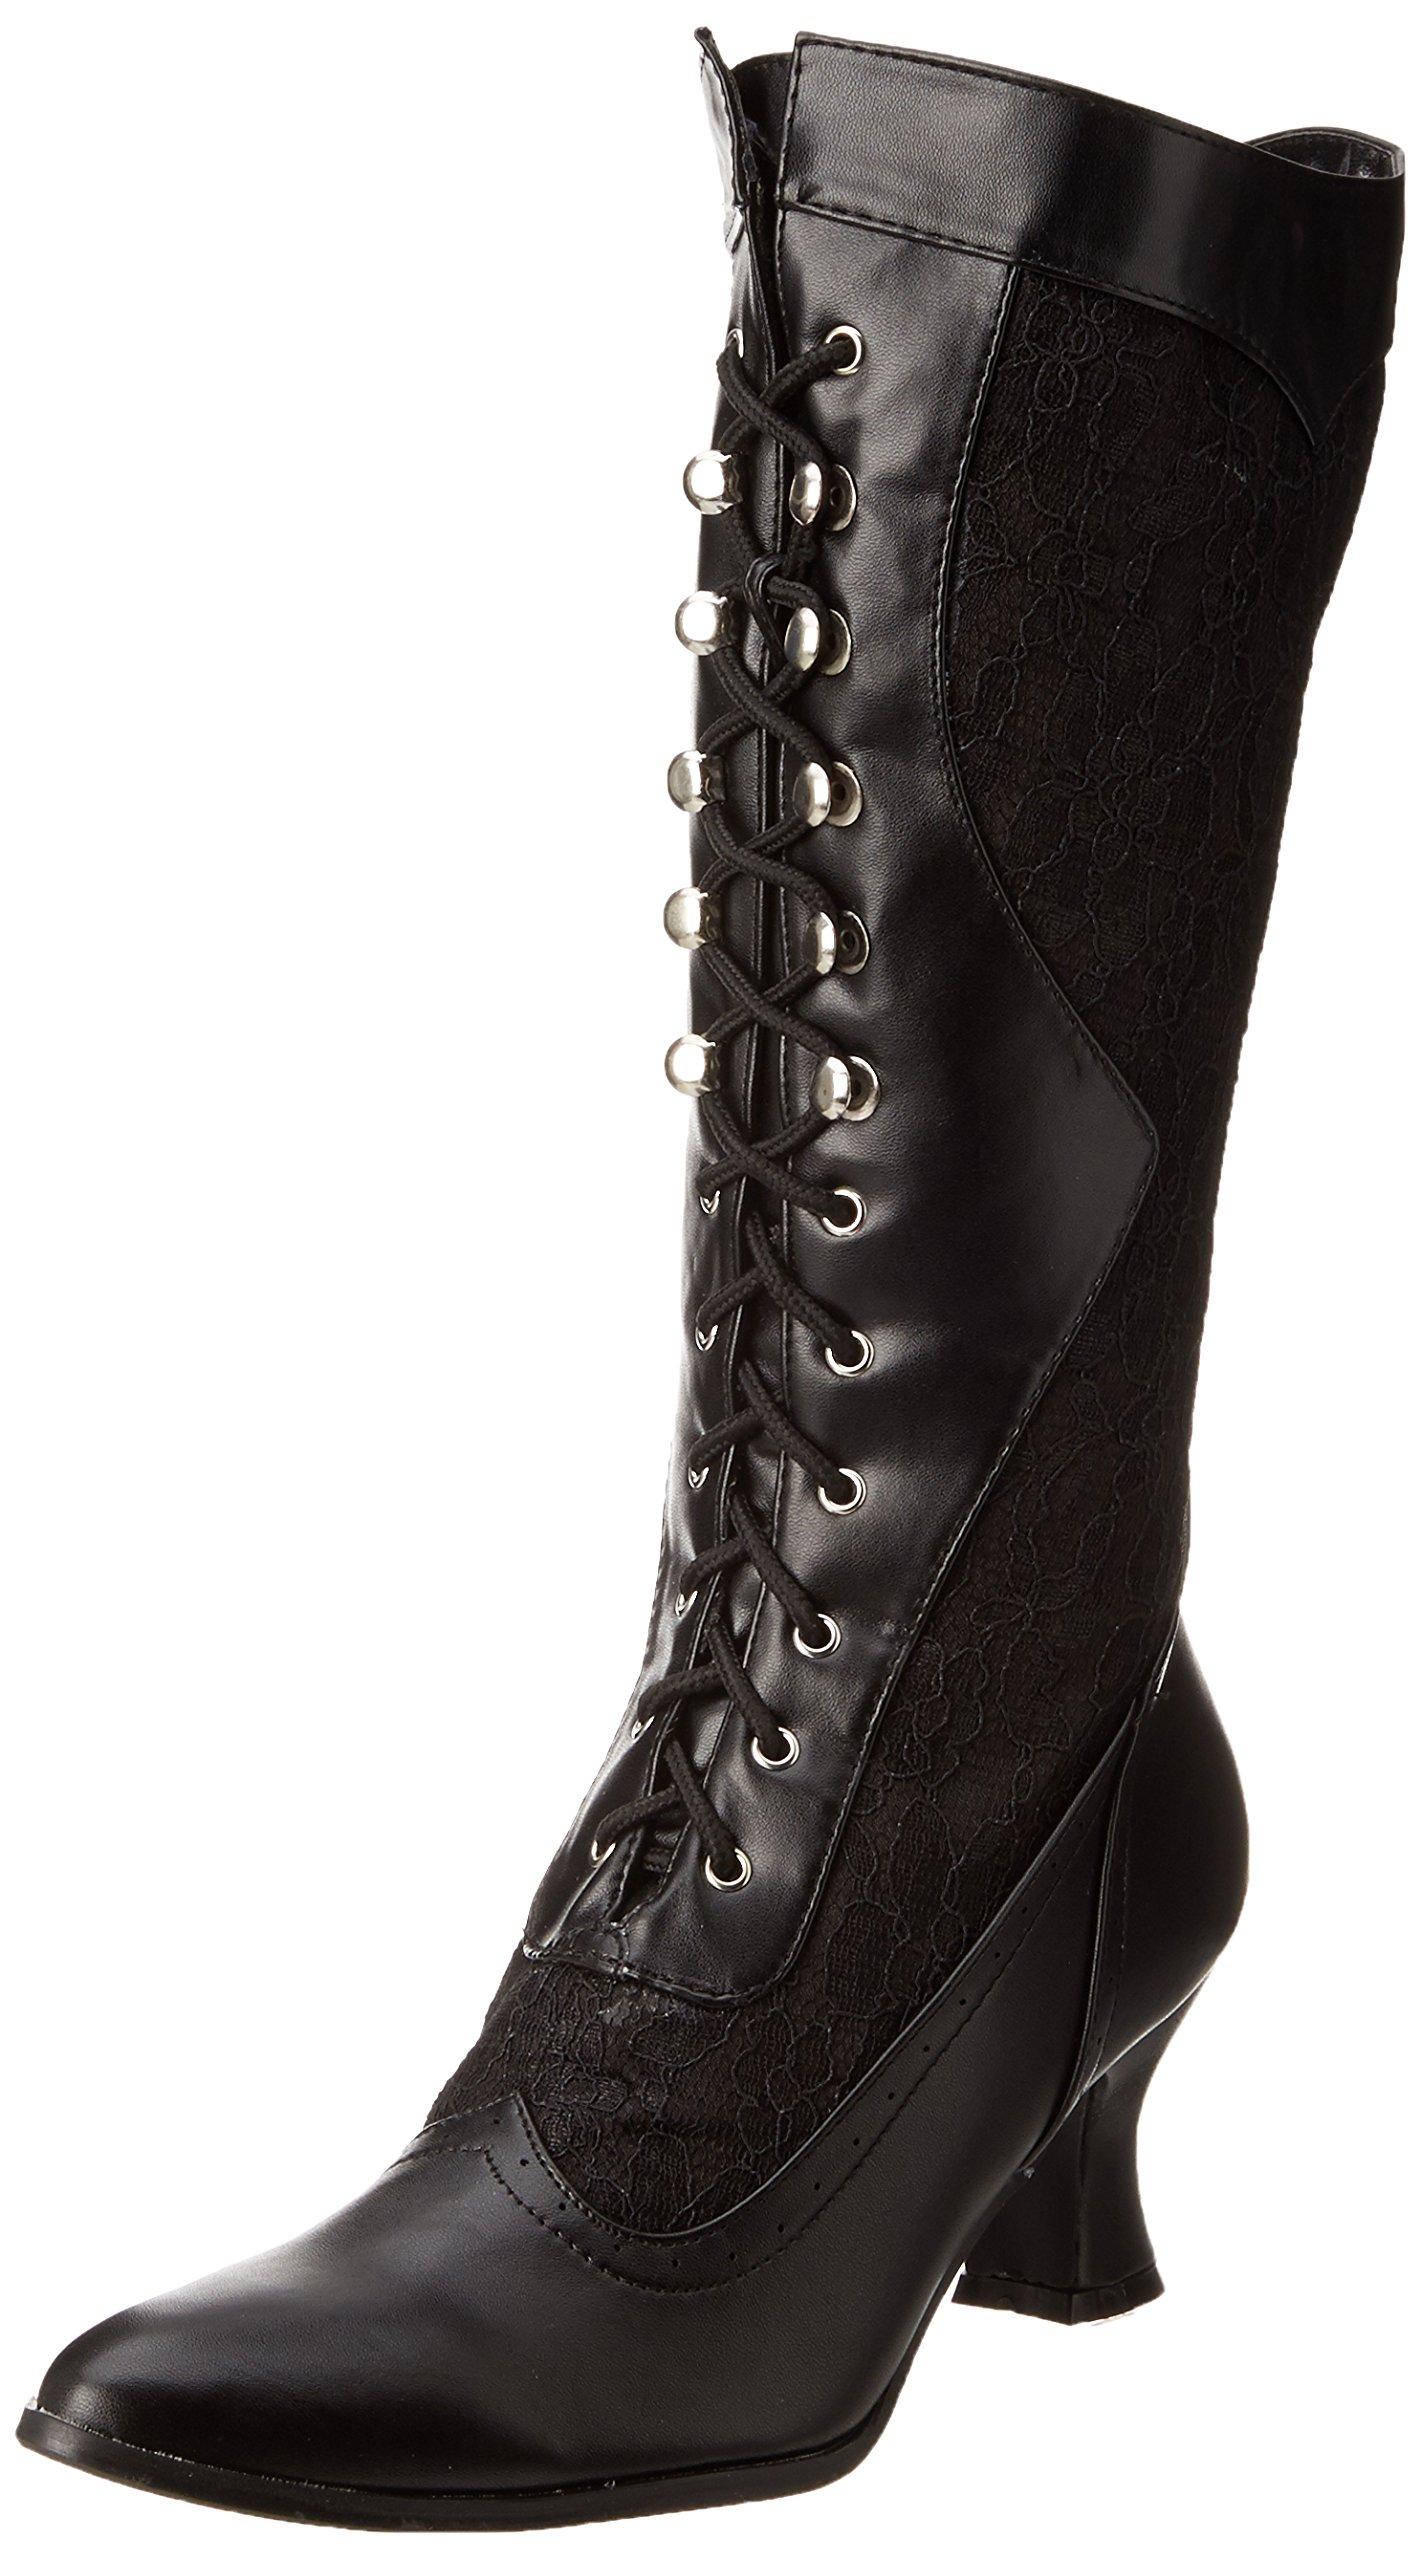 Ellie Shoes Women's 253 Rebecca Victorian Boot, Black, 8 M US